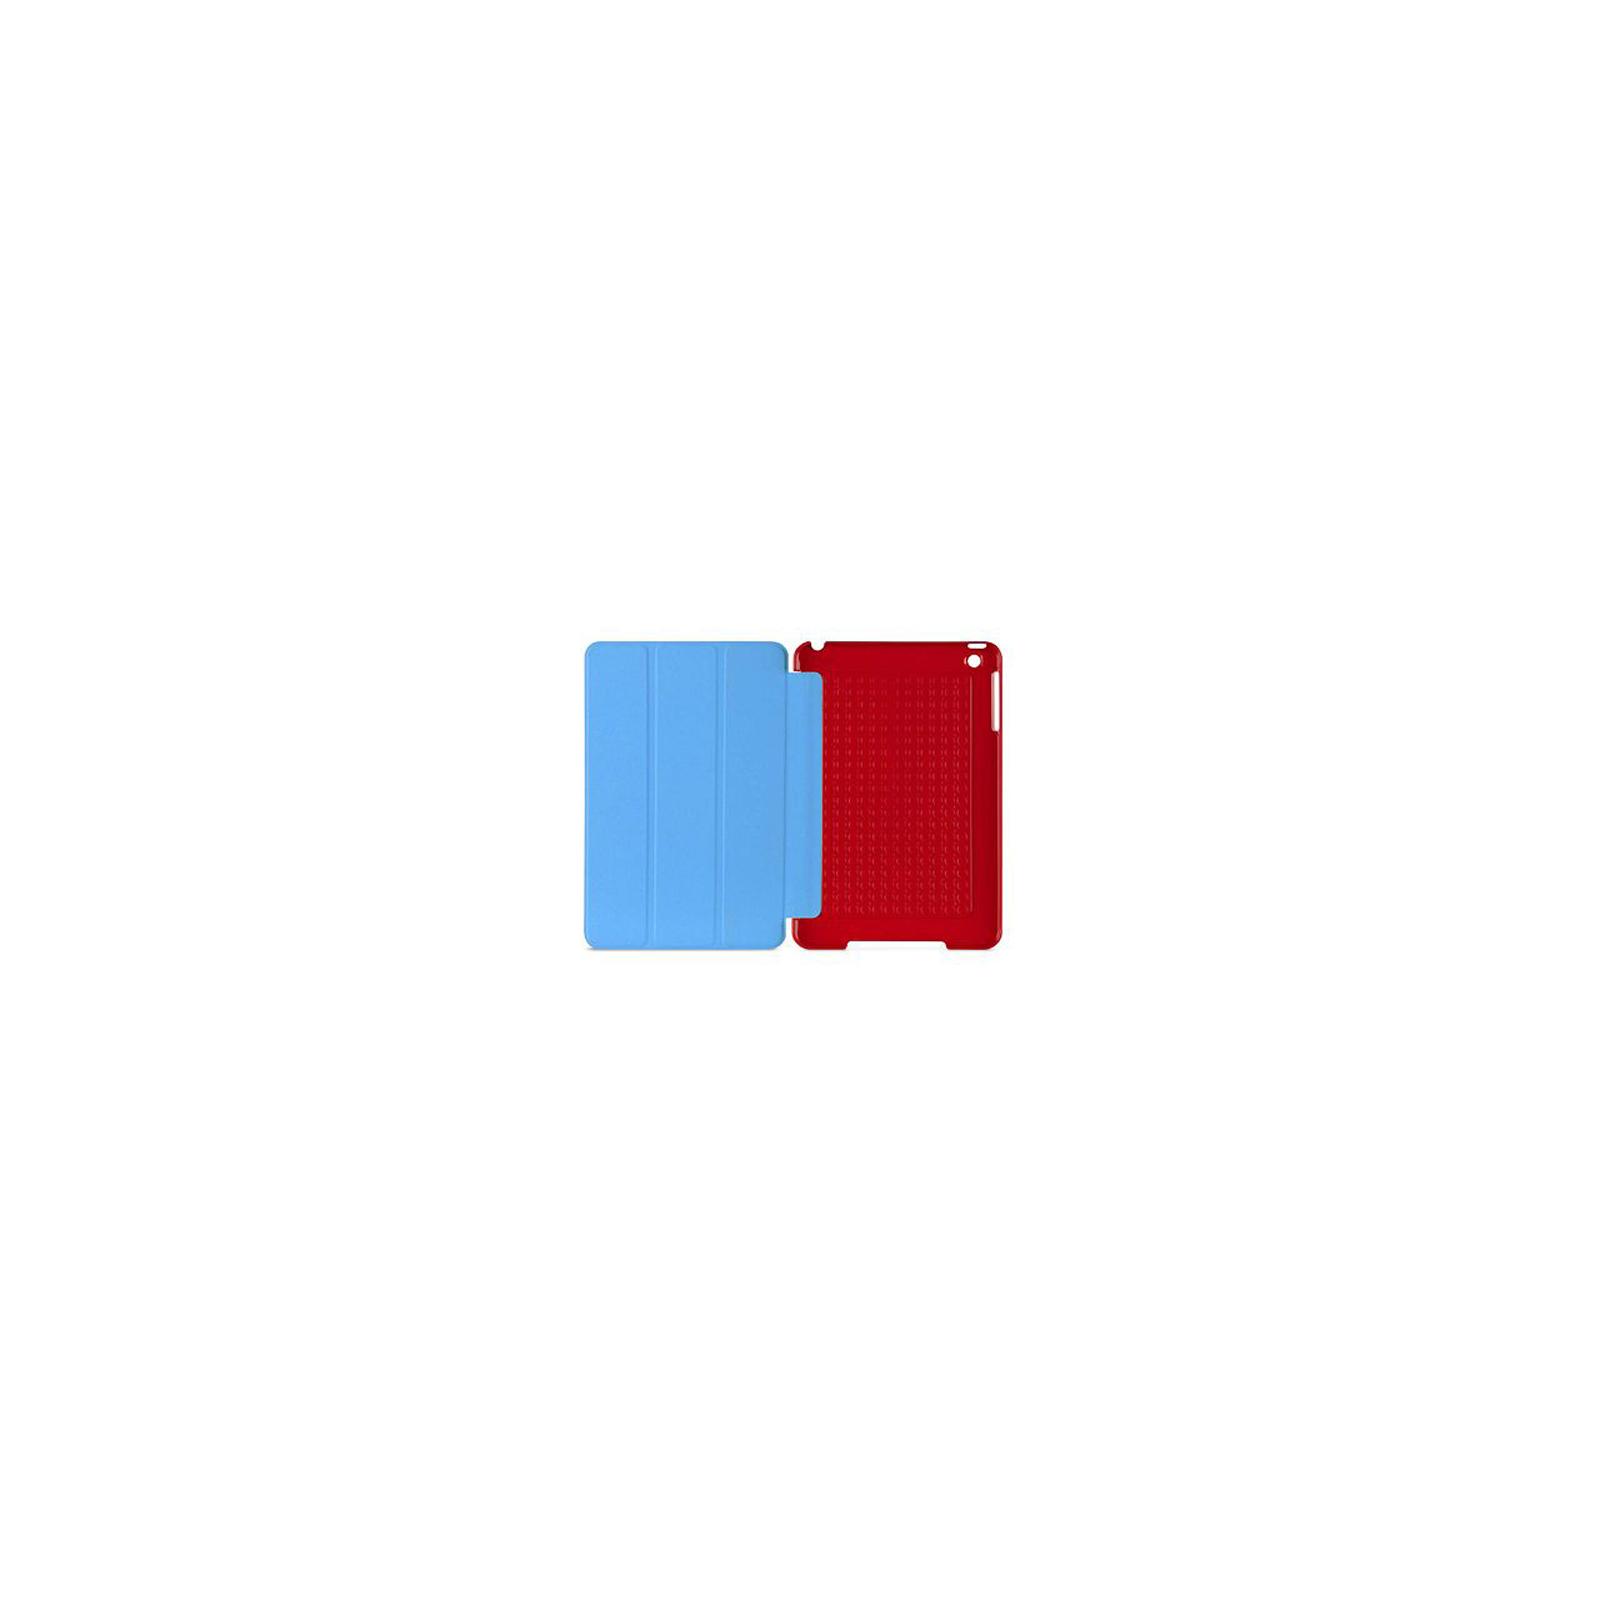 Чехол для планшета Belkin iPad mini LEGO Builder Case Red-Blue (F7N110B2C02) изображение 3